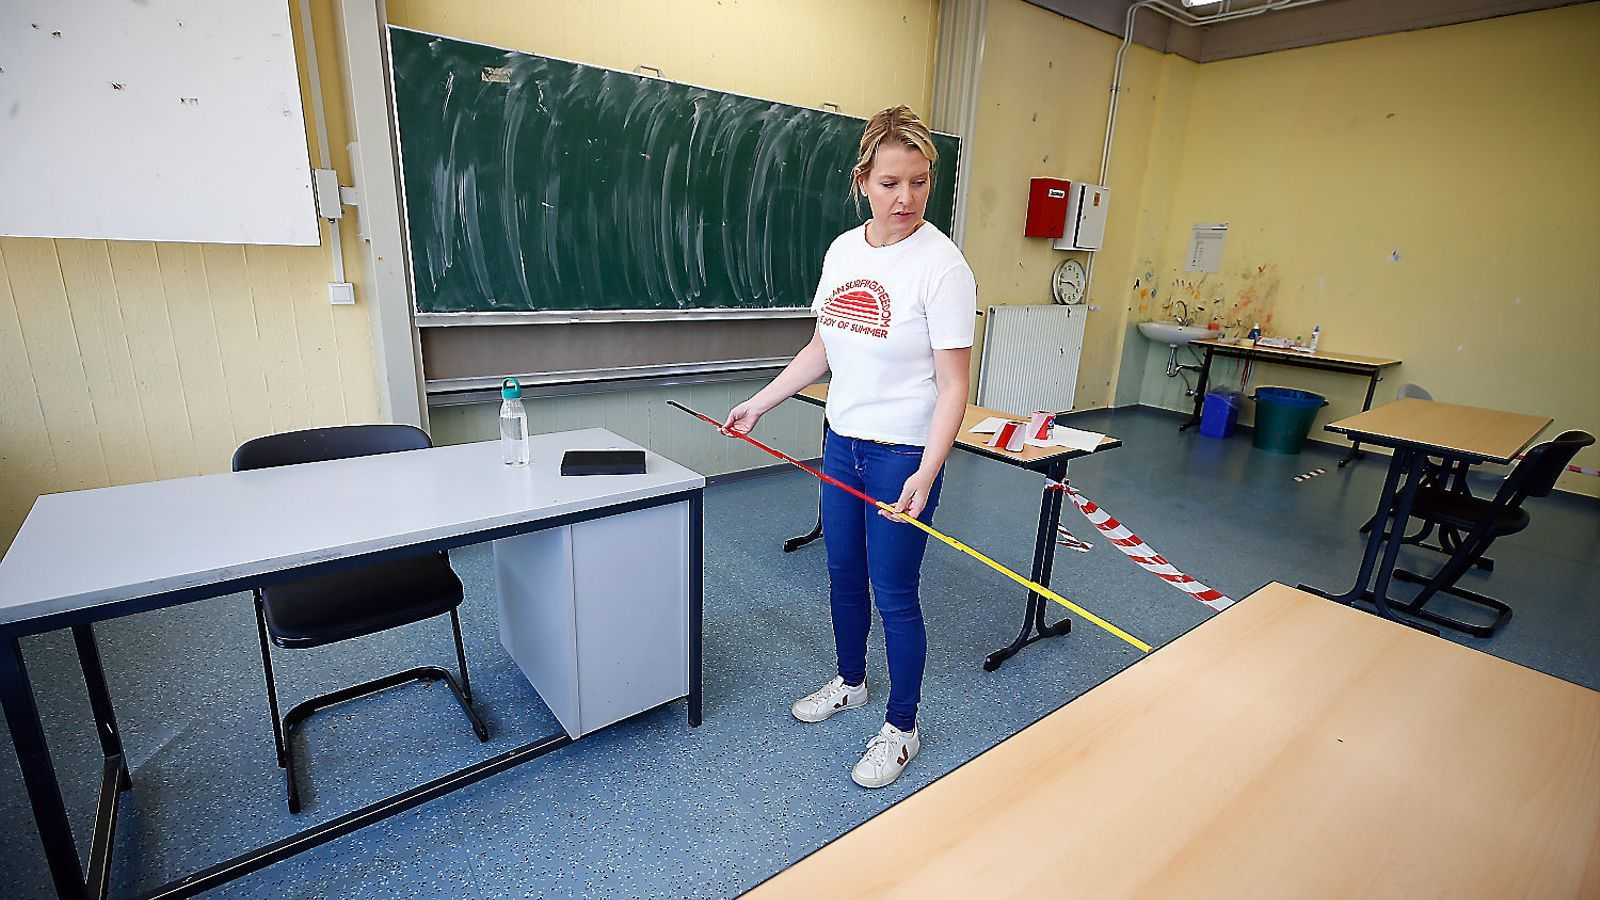 Una tornada atípica marcada per la distància i la higiene a l'aula ...